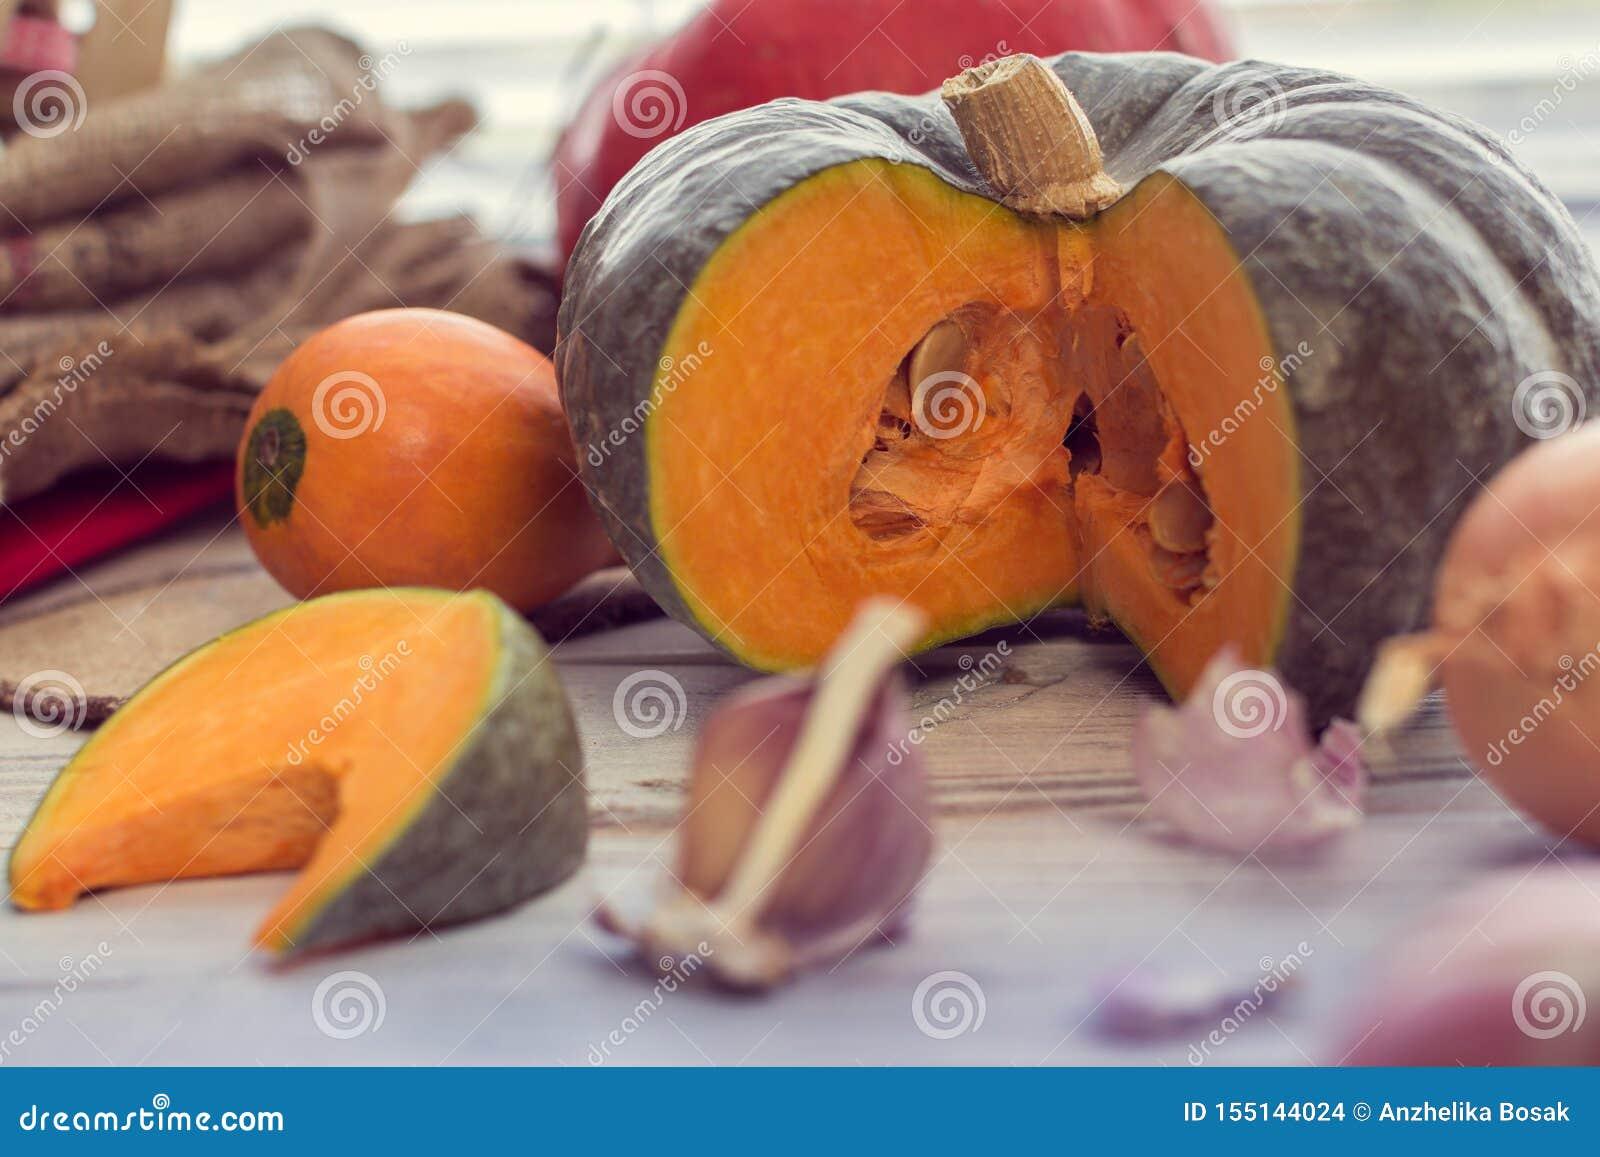 Slice of green pumpkin with garlic